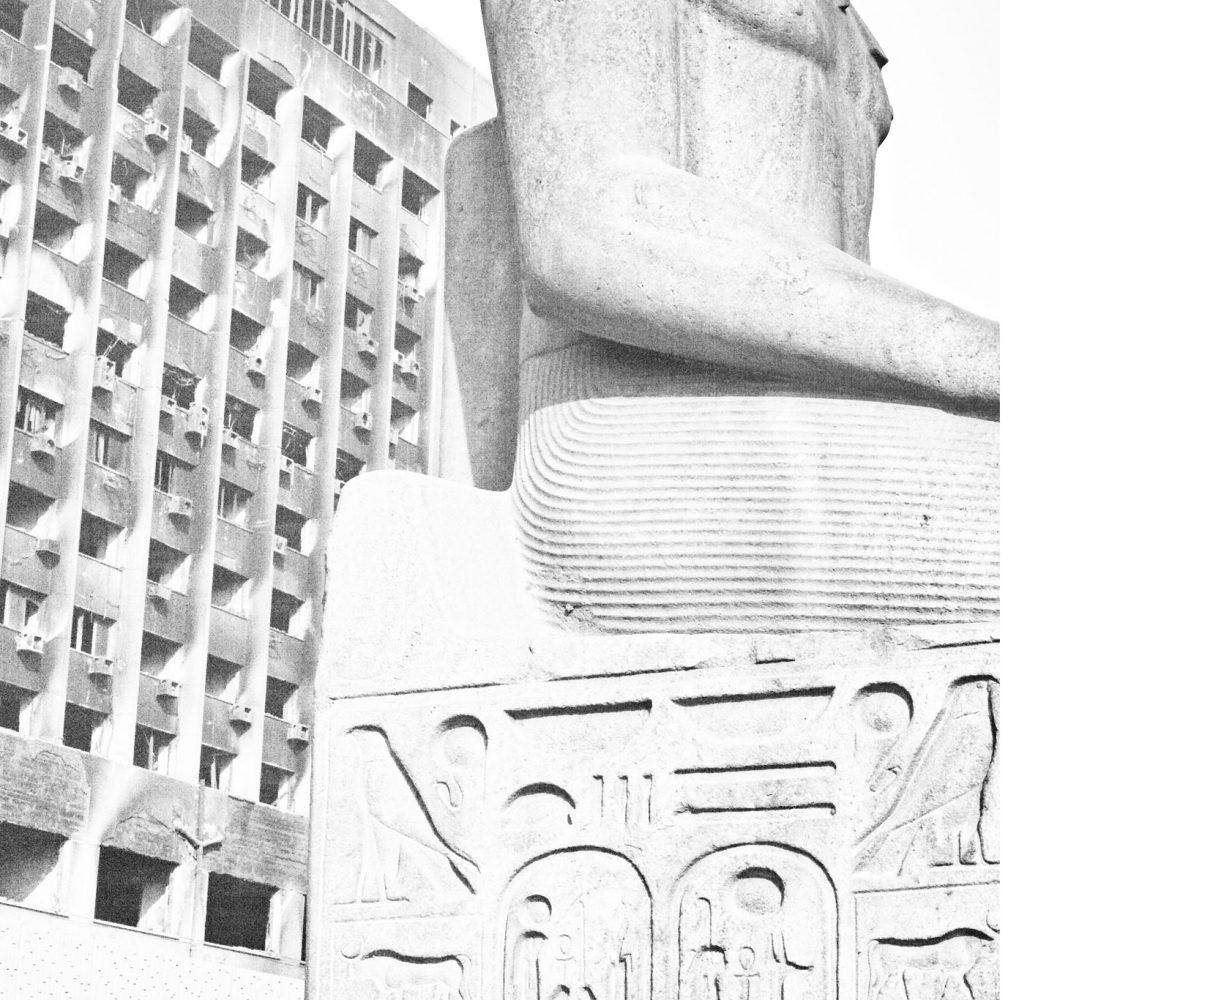 egypt_b&w_thevoyageur18